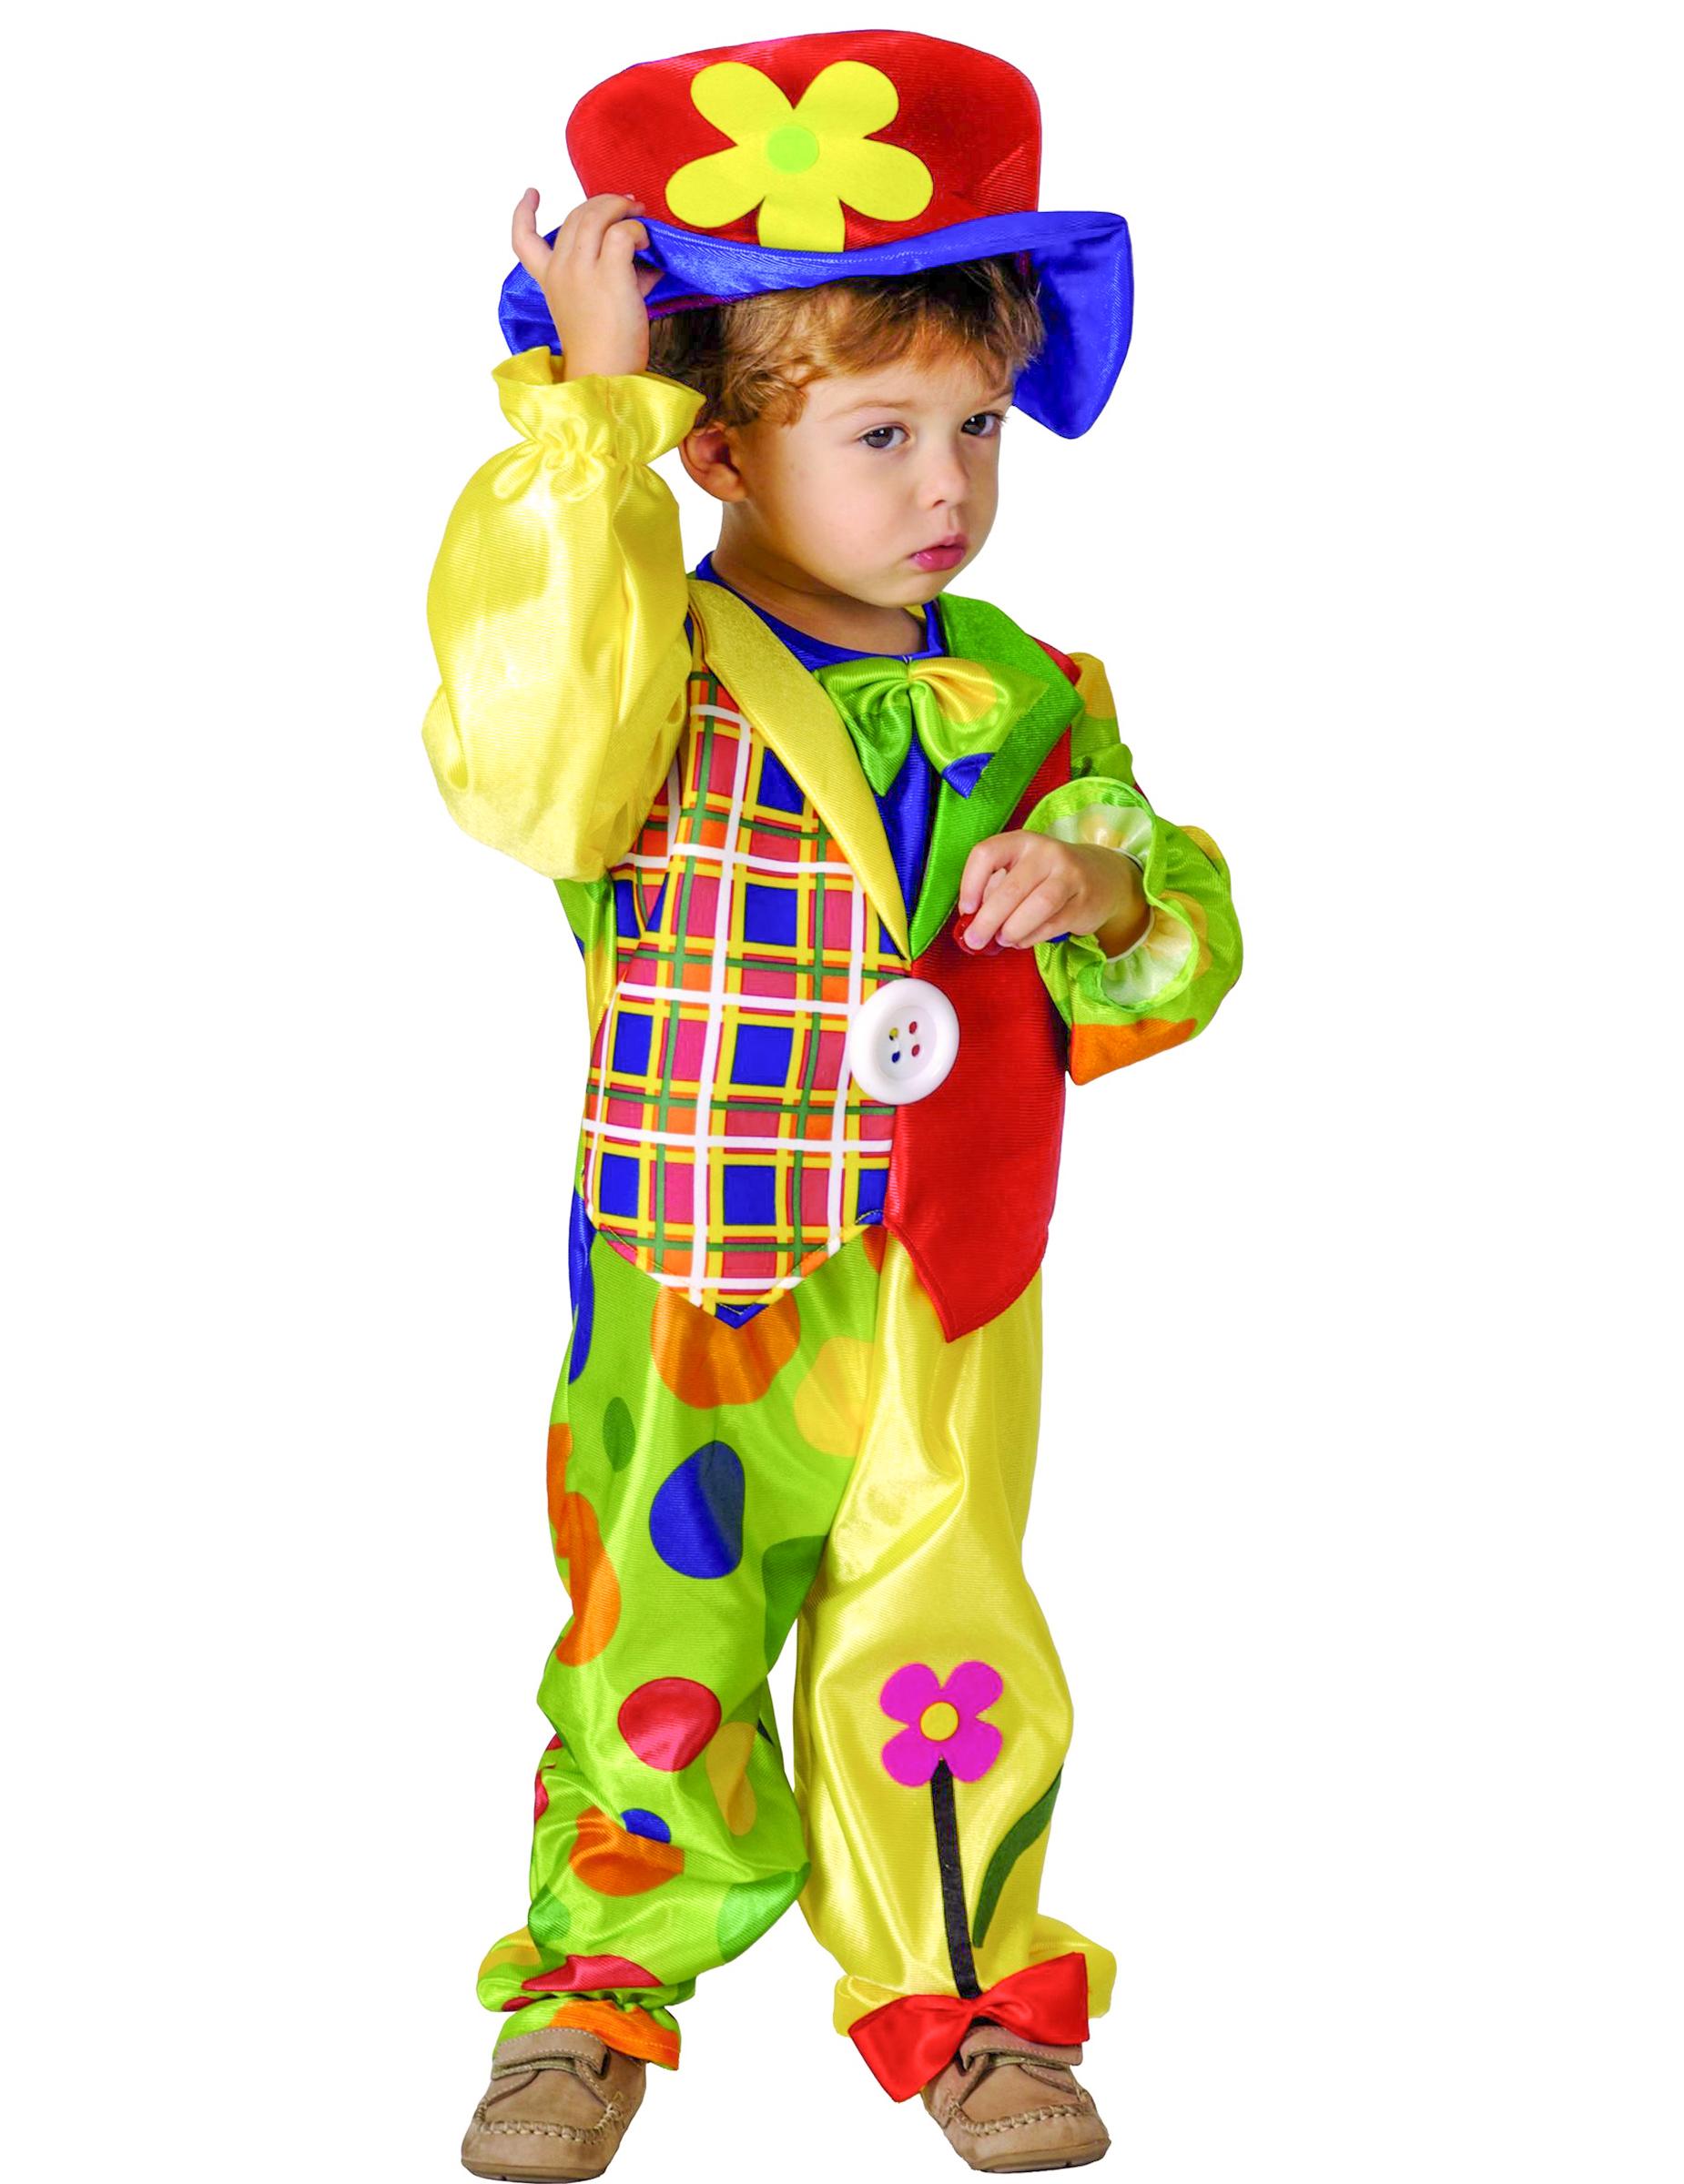 clowns kost m f r jungen kost me f r kinder und g nstige faschingskost me vegaoo. Black Bedroom Furniture Sets. Home Design Ideas